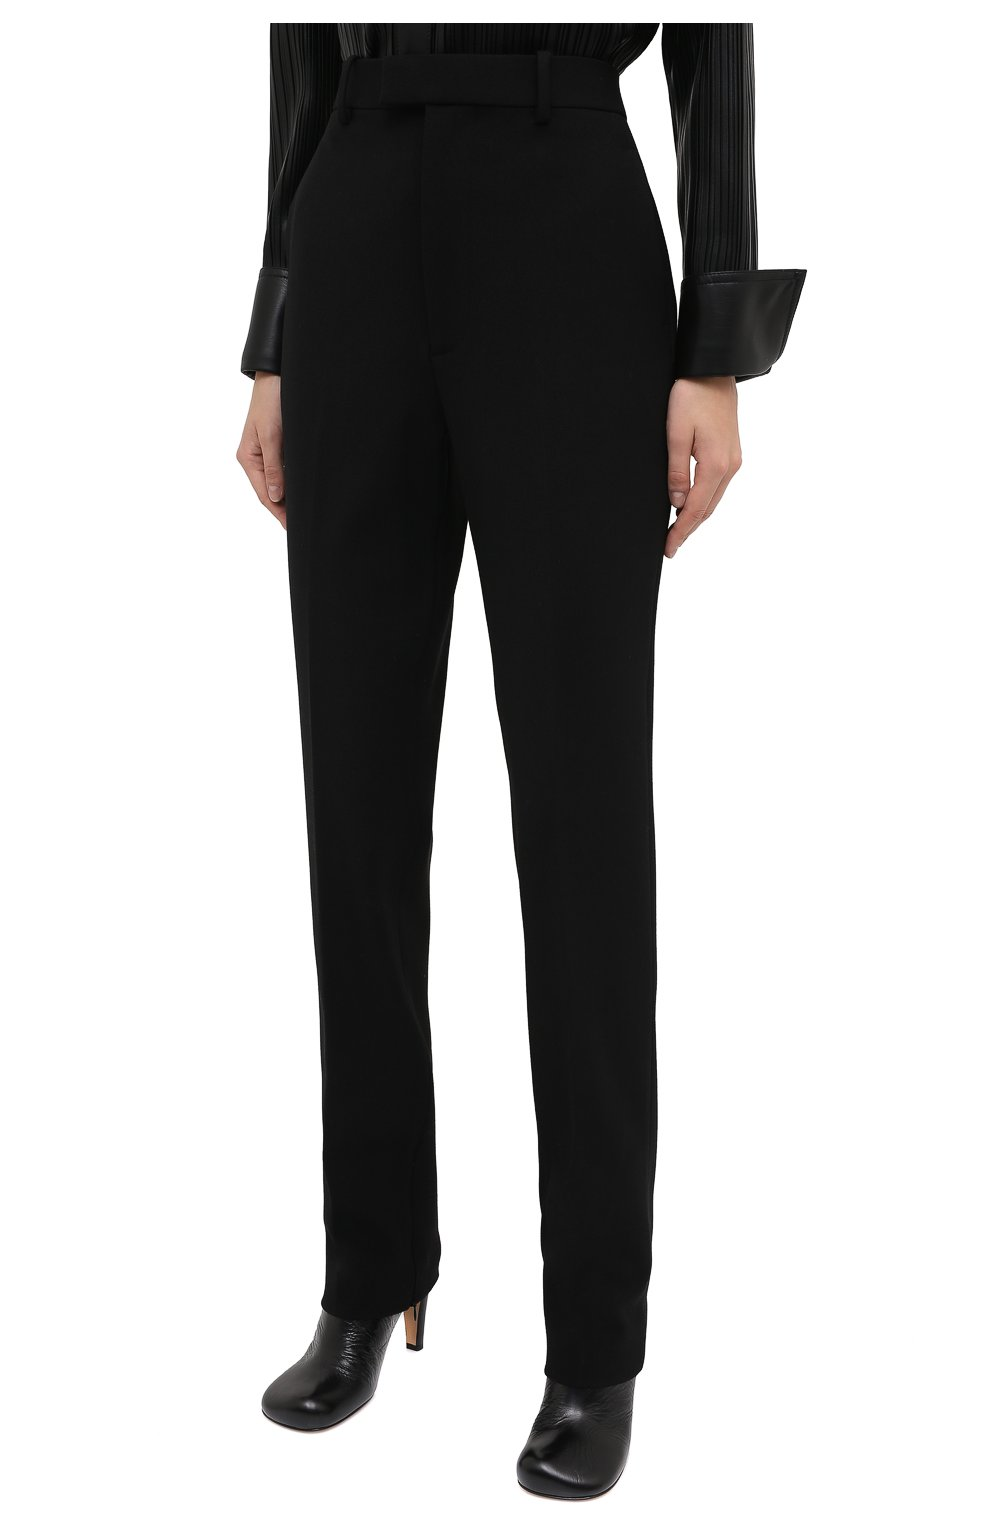 Женские брюки BOTTEGA VENETA черного цвета, арт. 636529/V02W0 | Фото 4